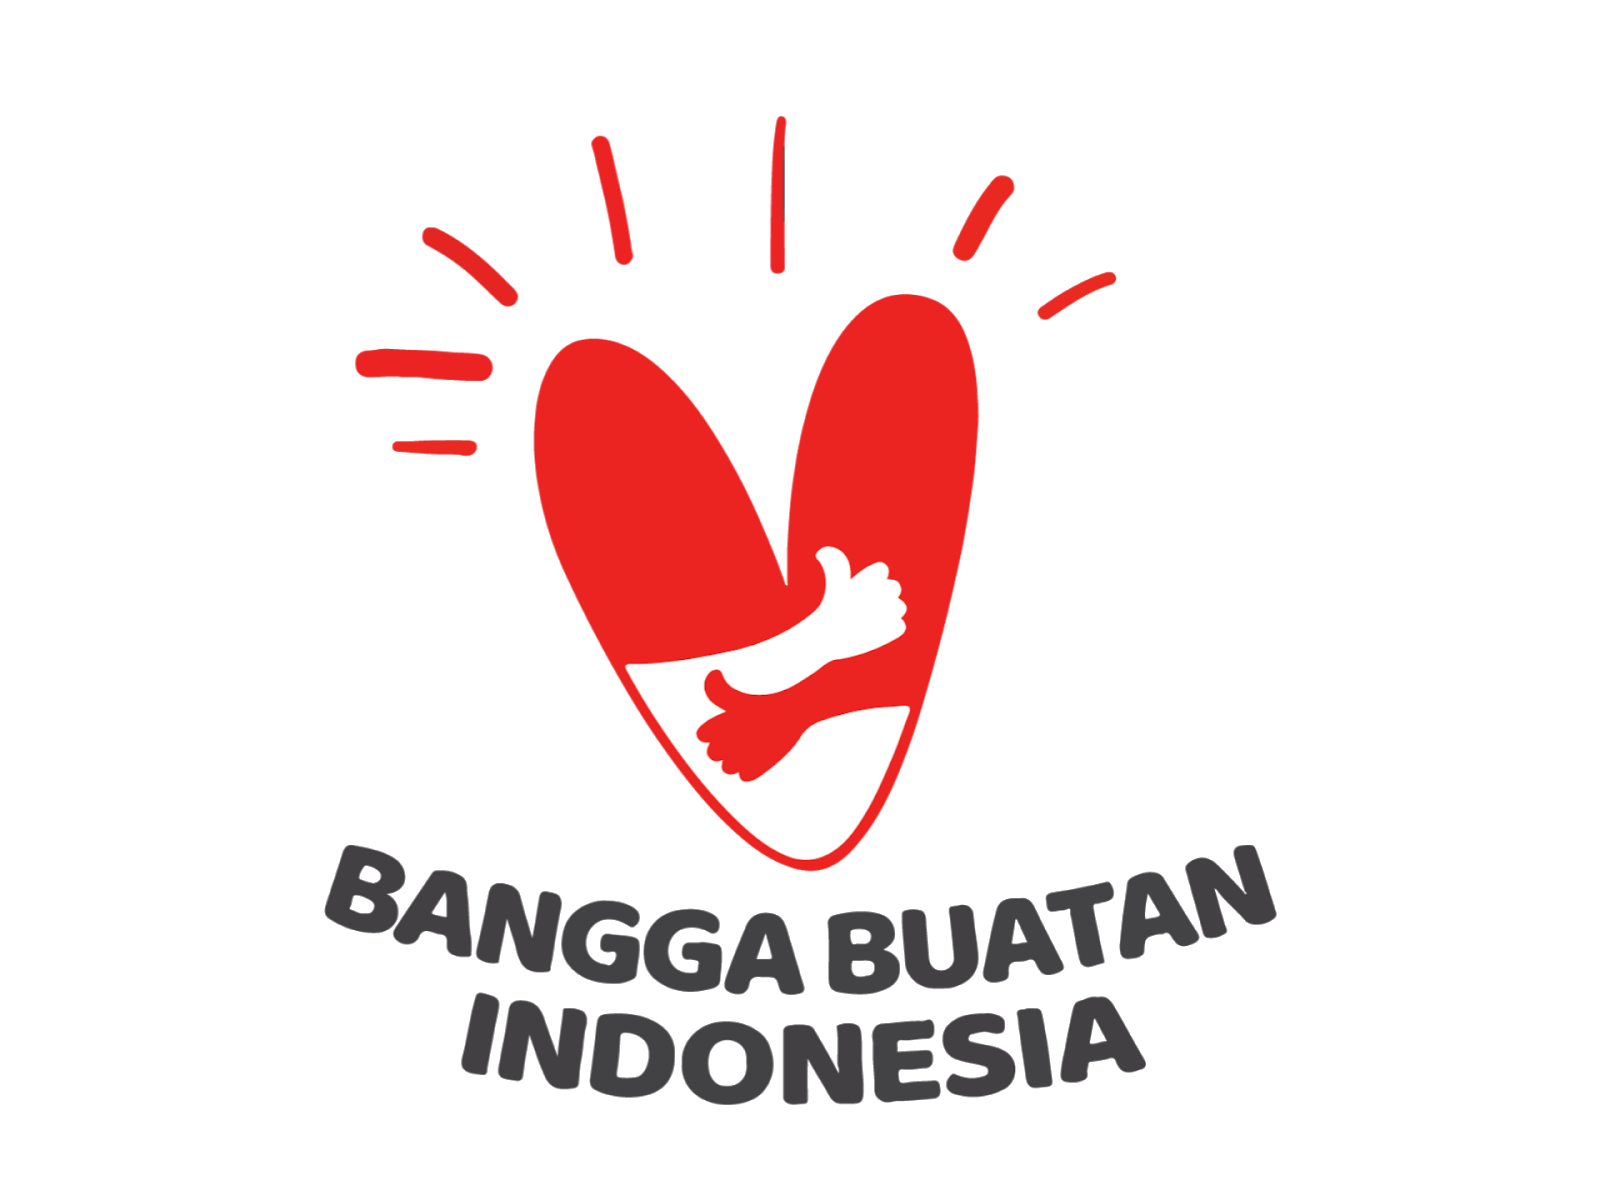 Logo Bangga Buatan Indonesia Format PNG